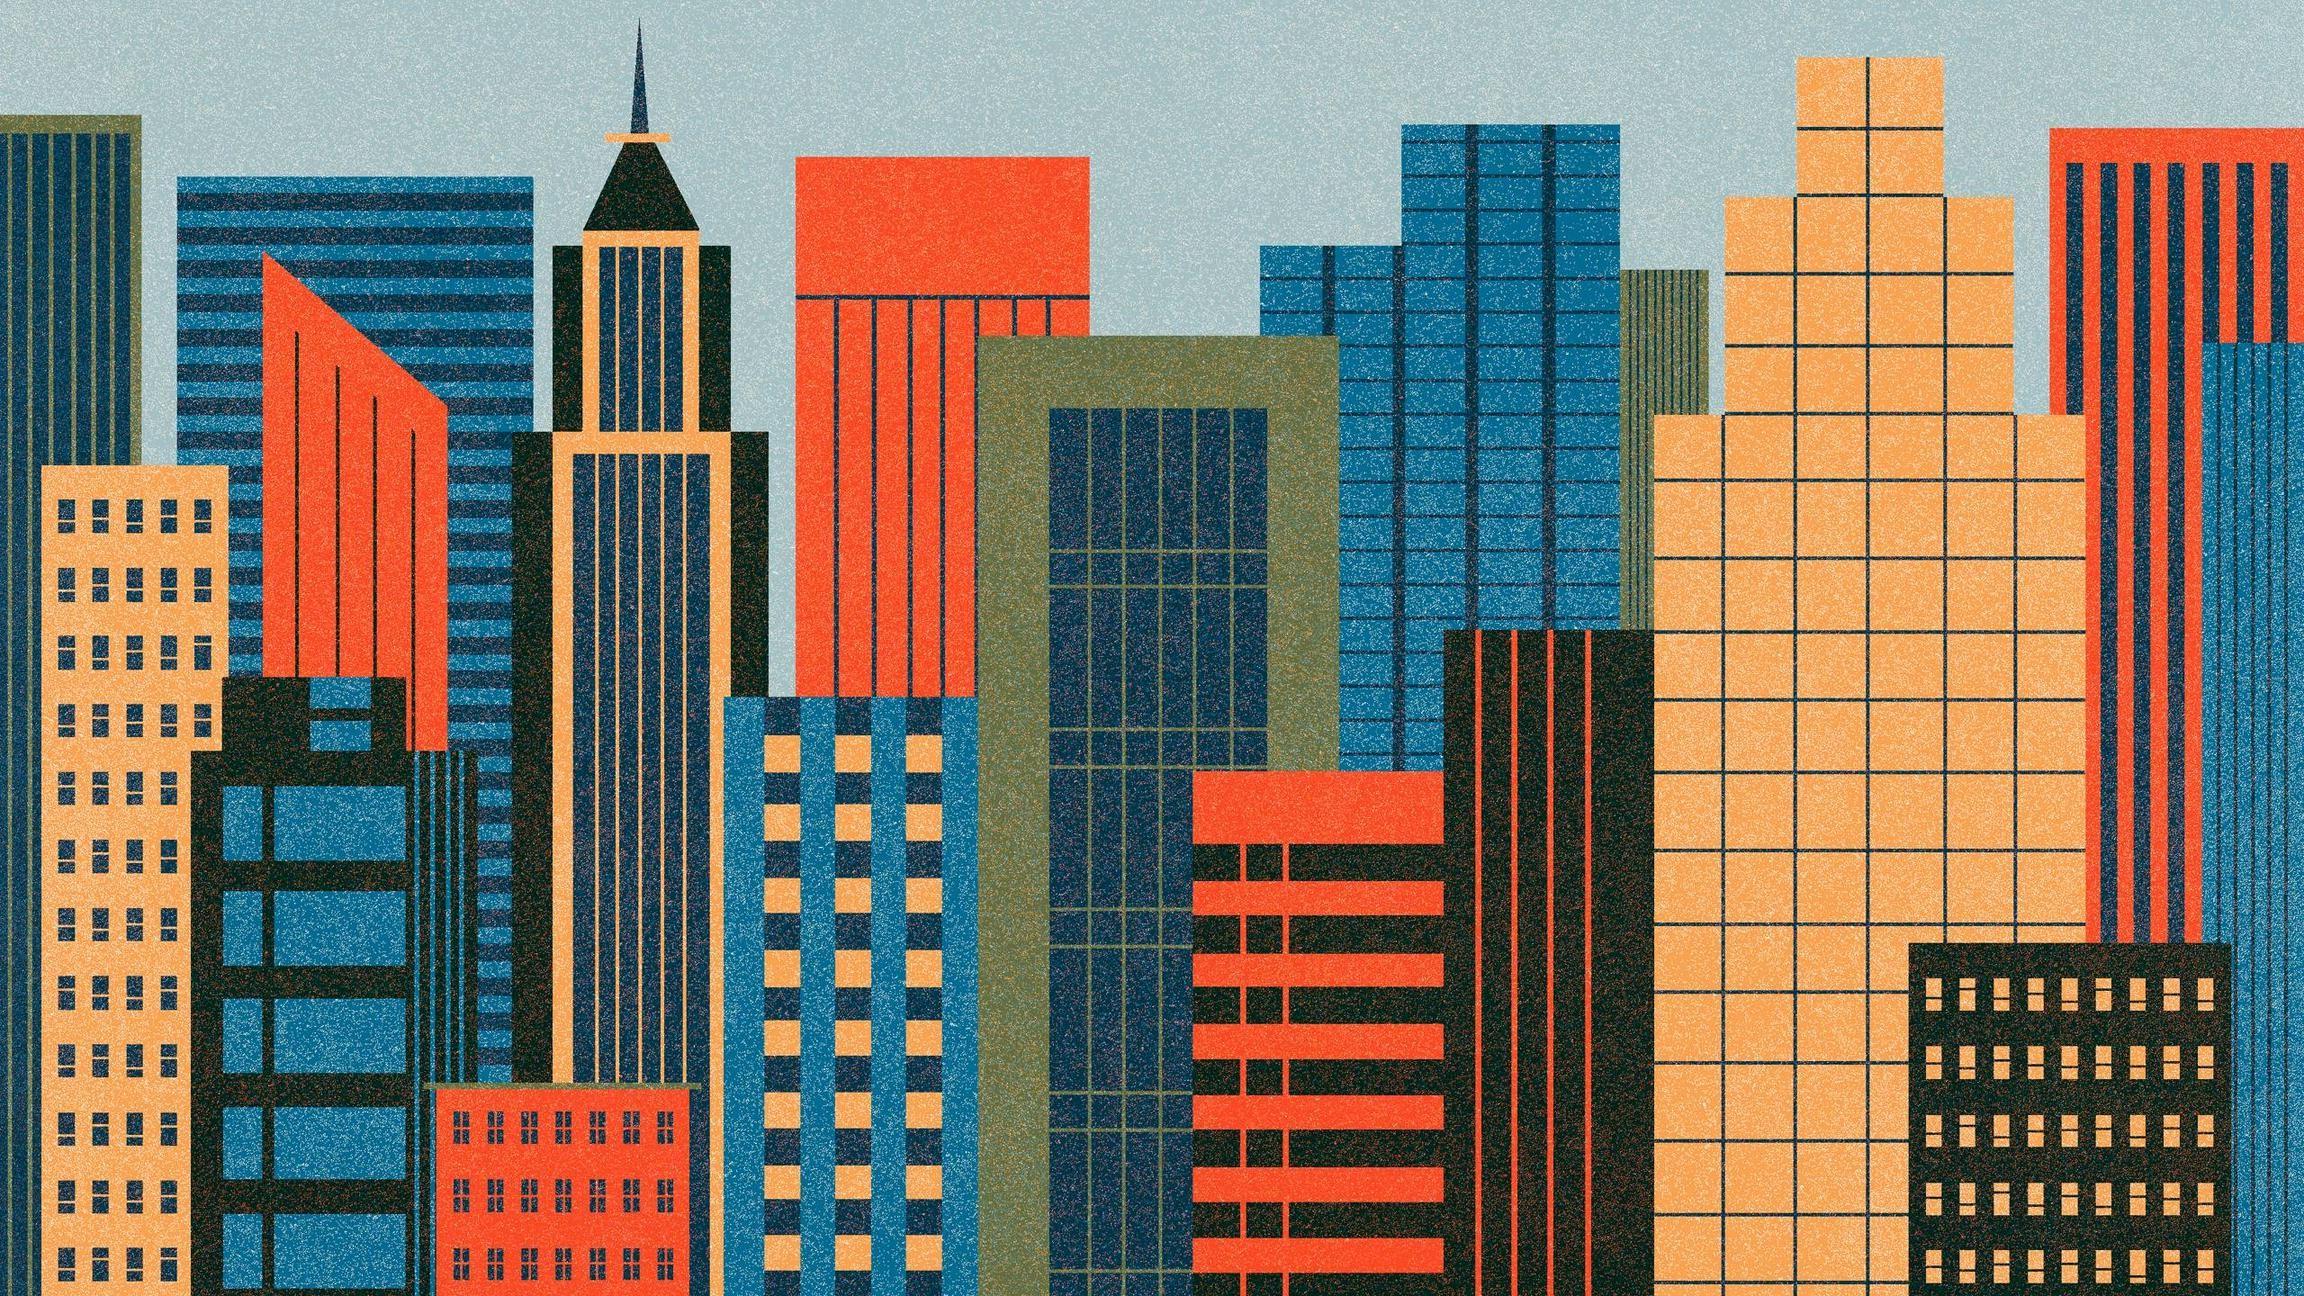 City Abstract Building Skyline Skyscraper Pattern Metropolis Facade Metropolitan Area Tower Block 2304x1296 Px